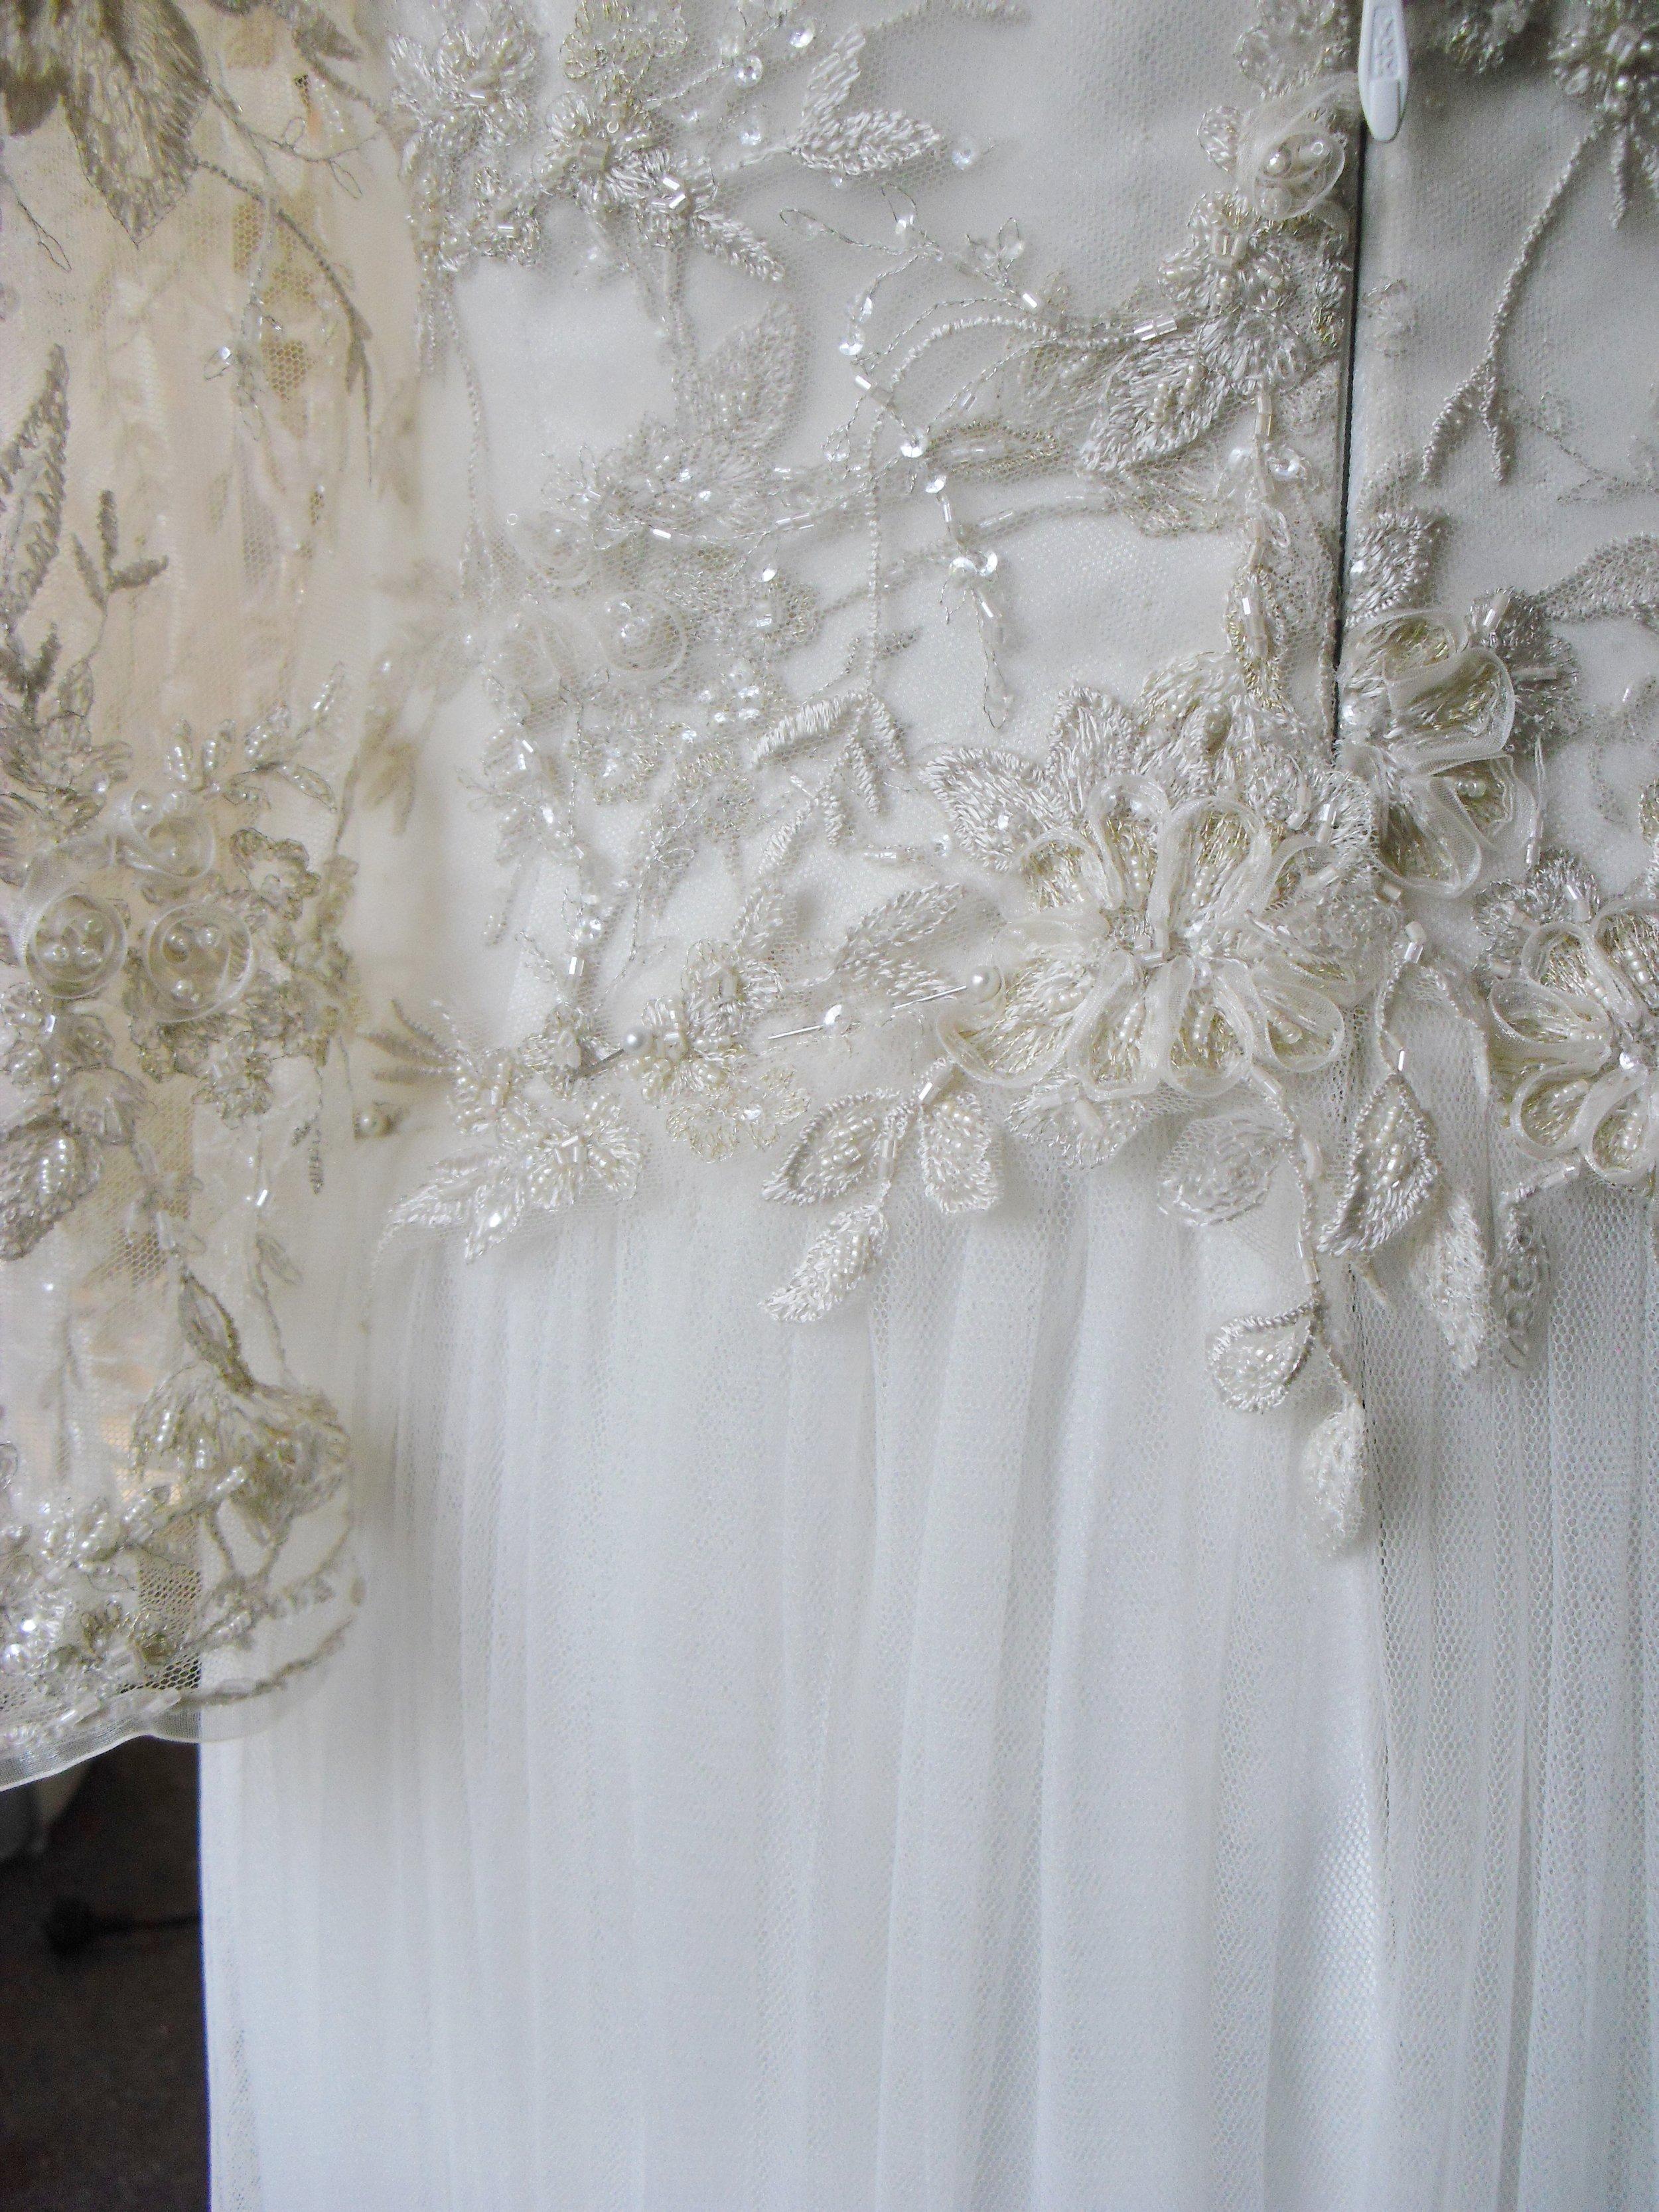 v - silk satin crepe, beaded lace - Chistchurch bride - studio shot